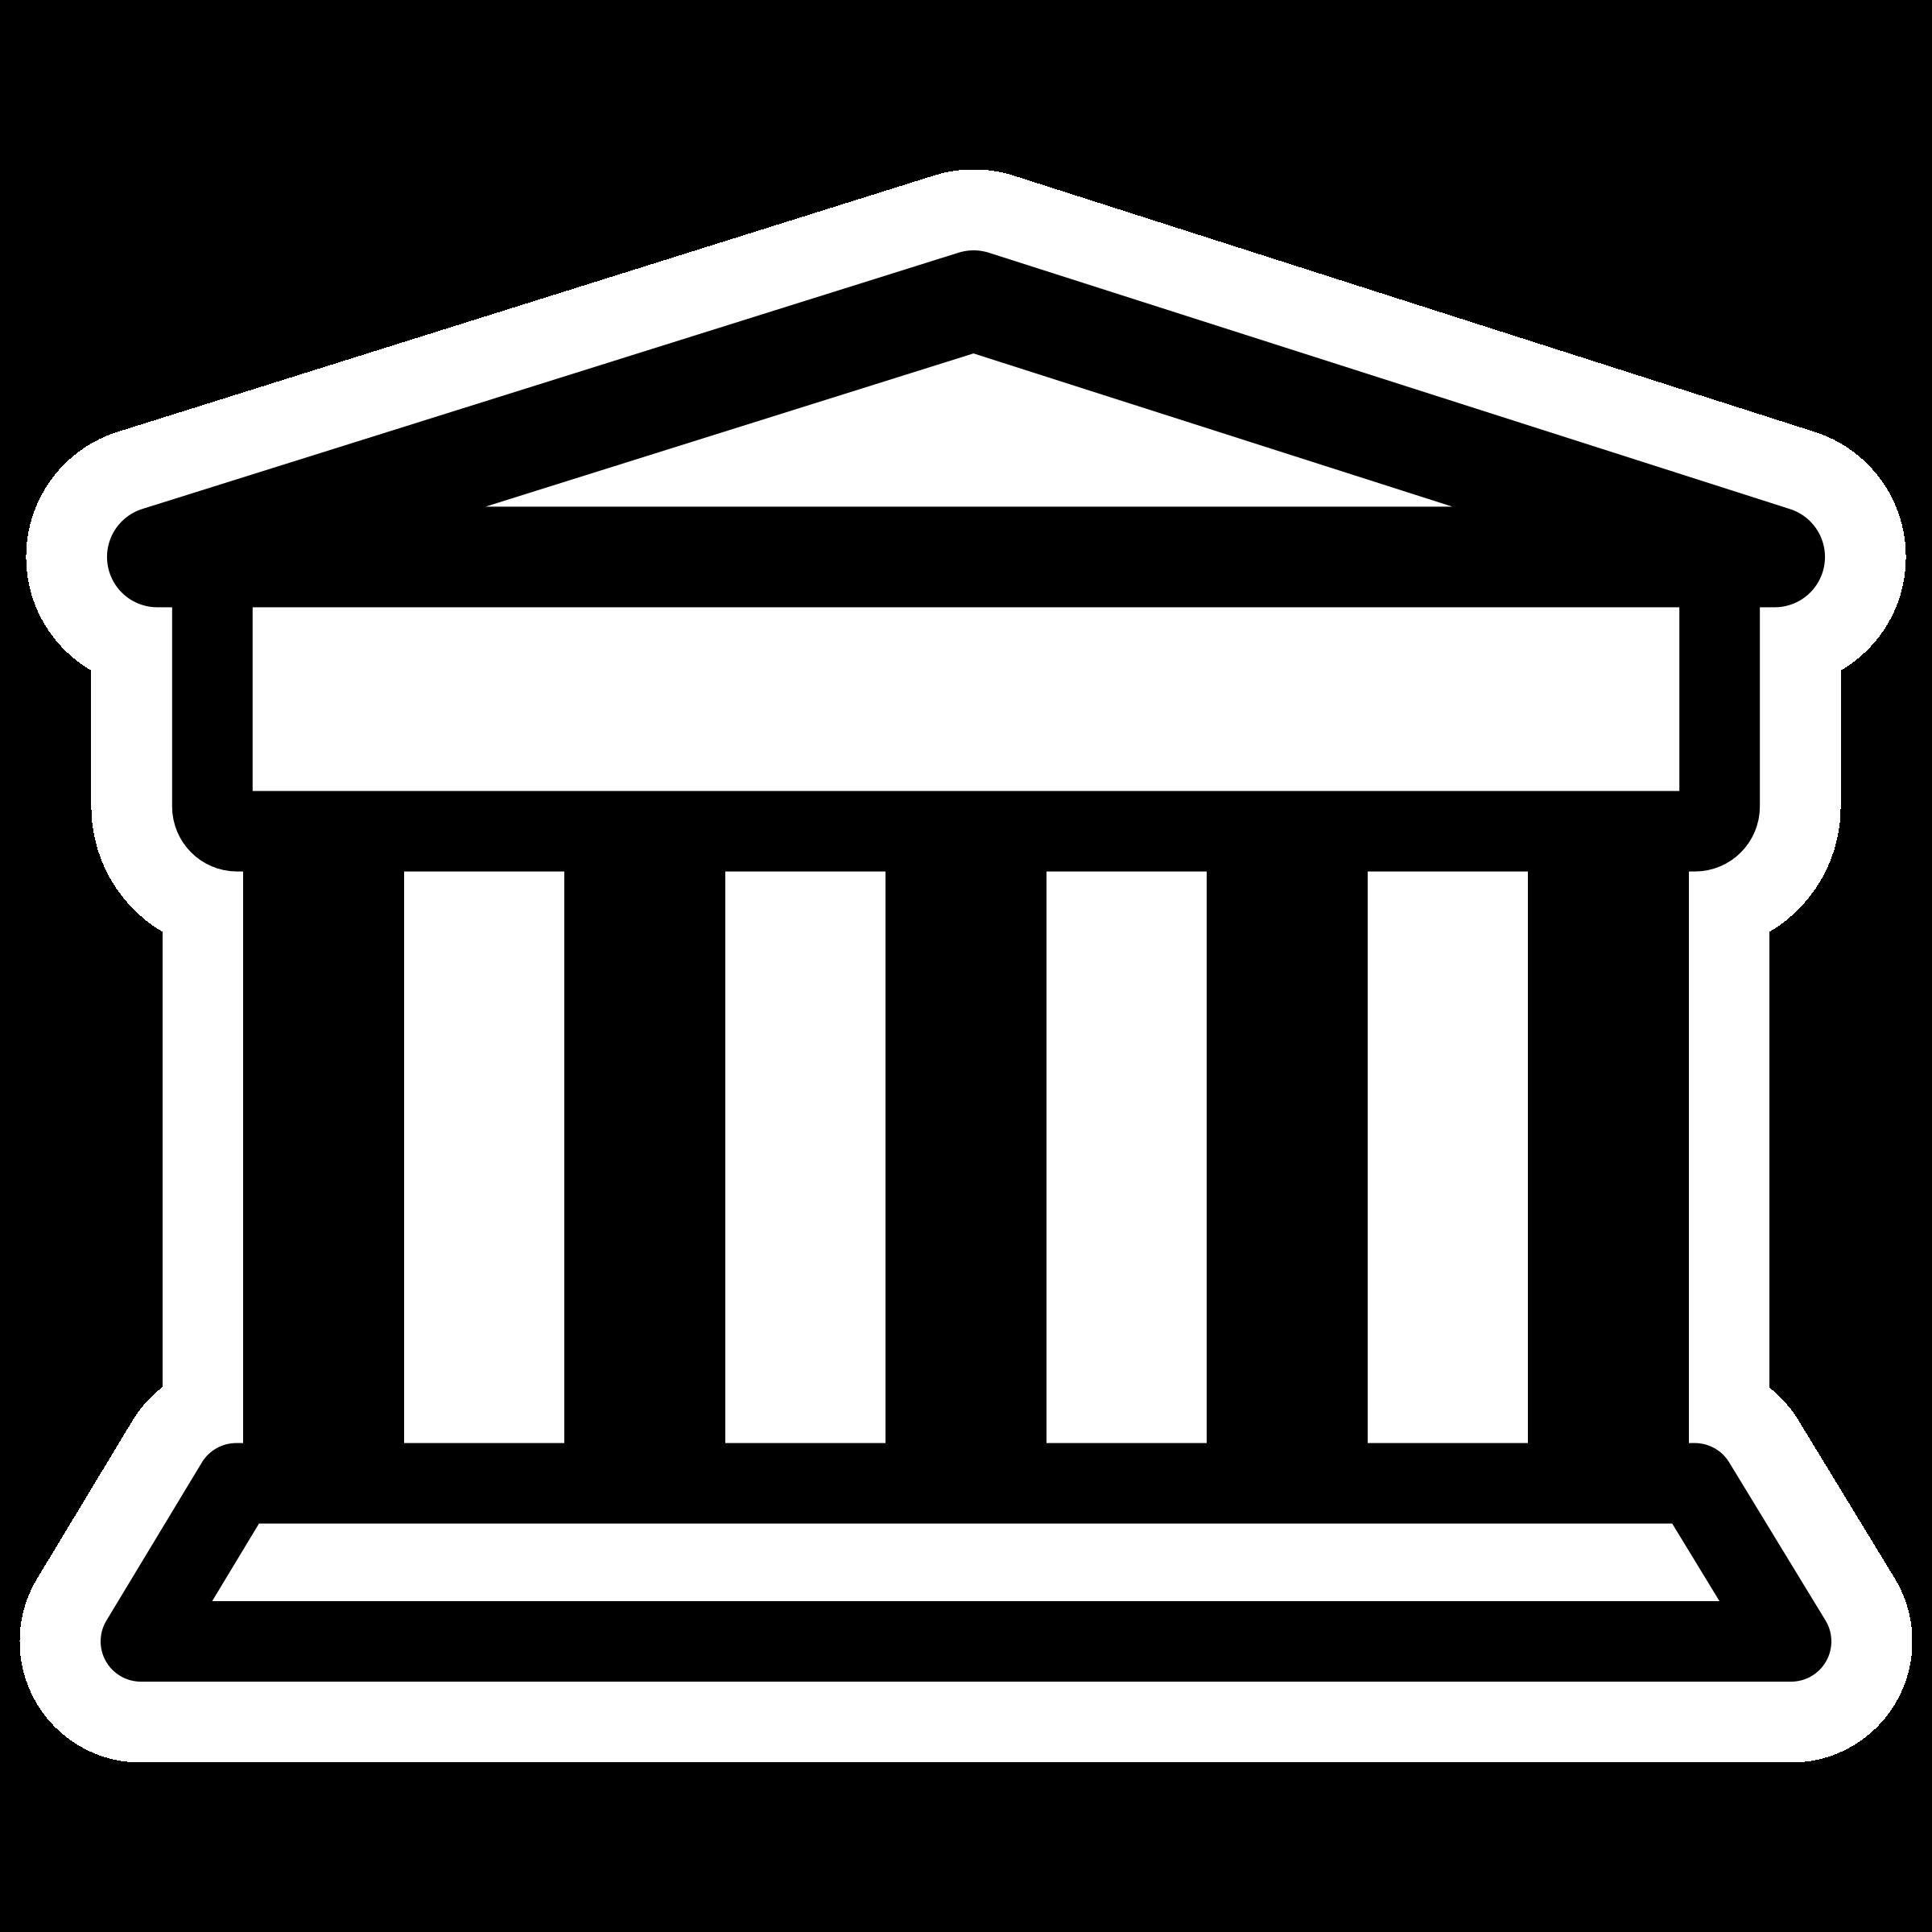 банк.png